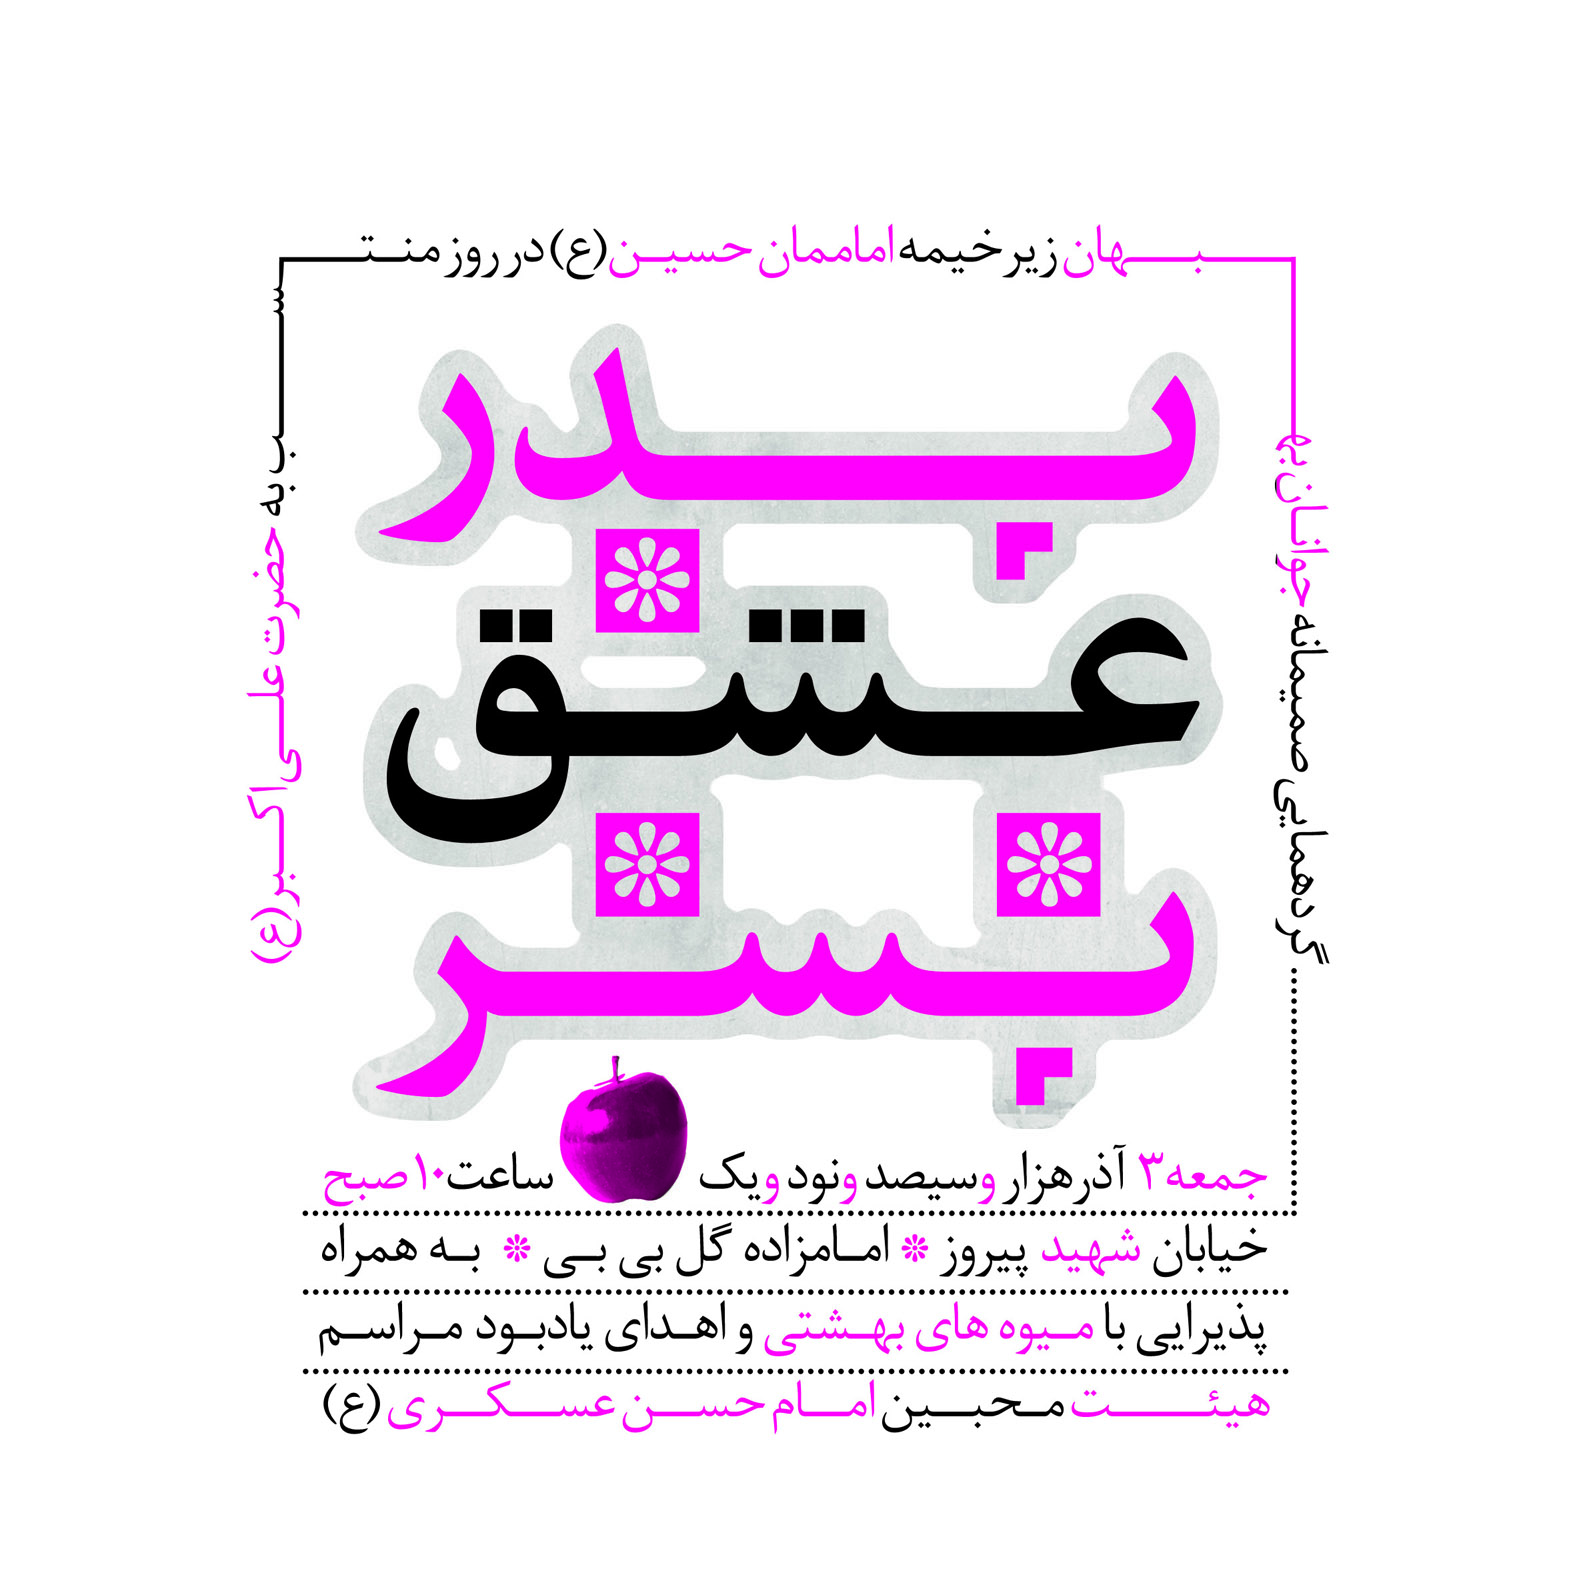 http://s2.picofile.com/file/7579189993/Pedar_1_copy.jpg